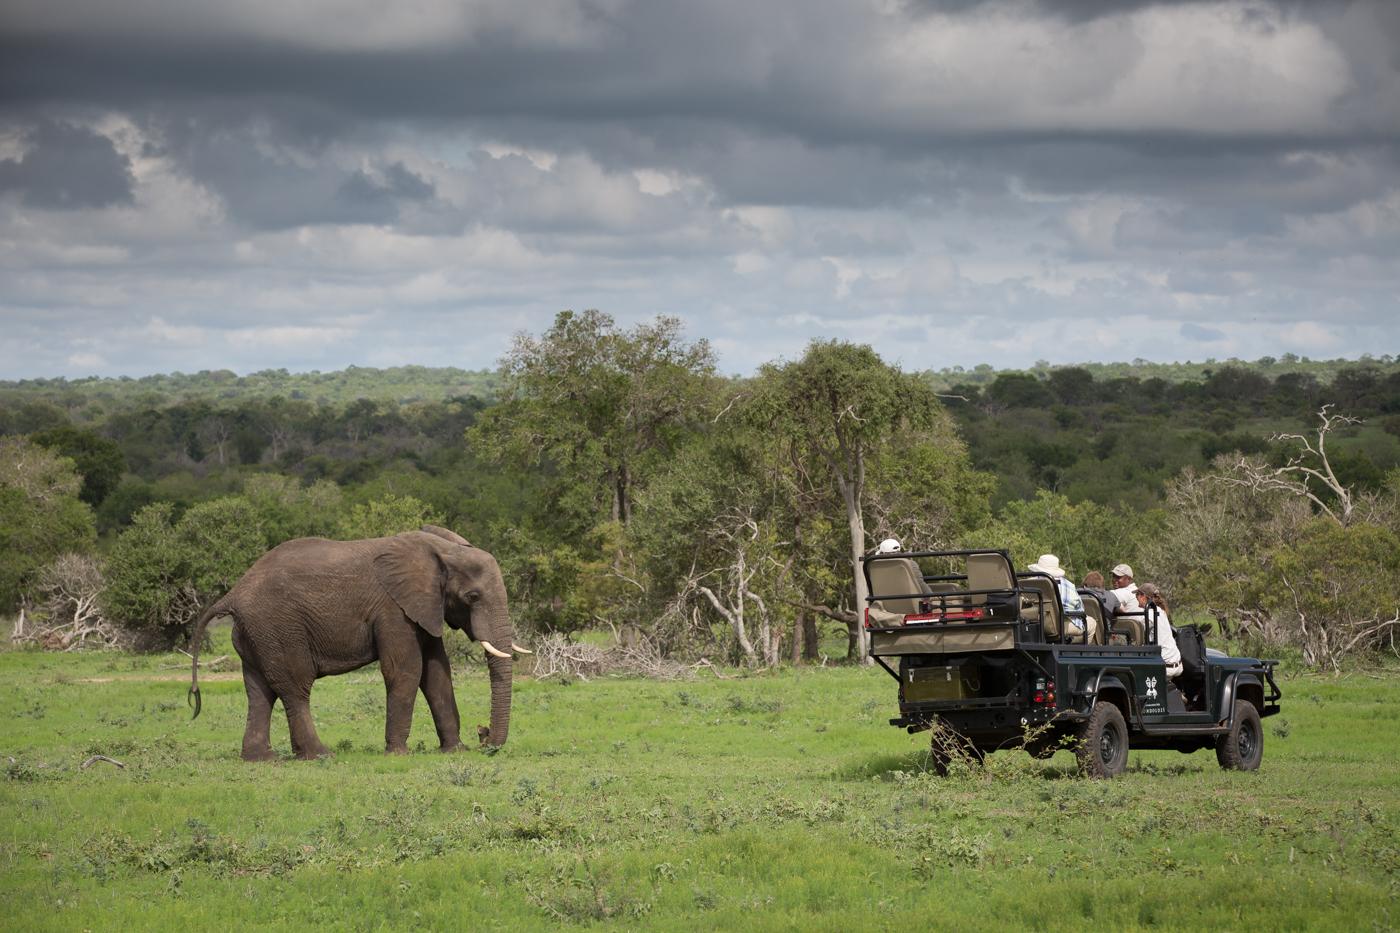 Boon_Elephants